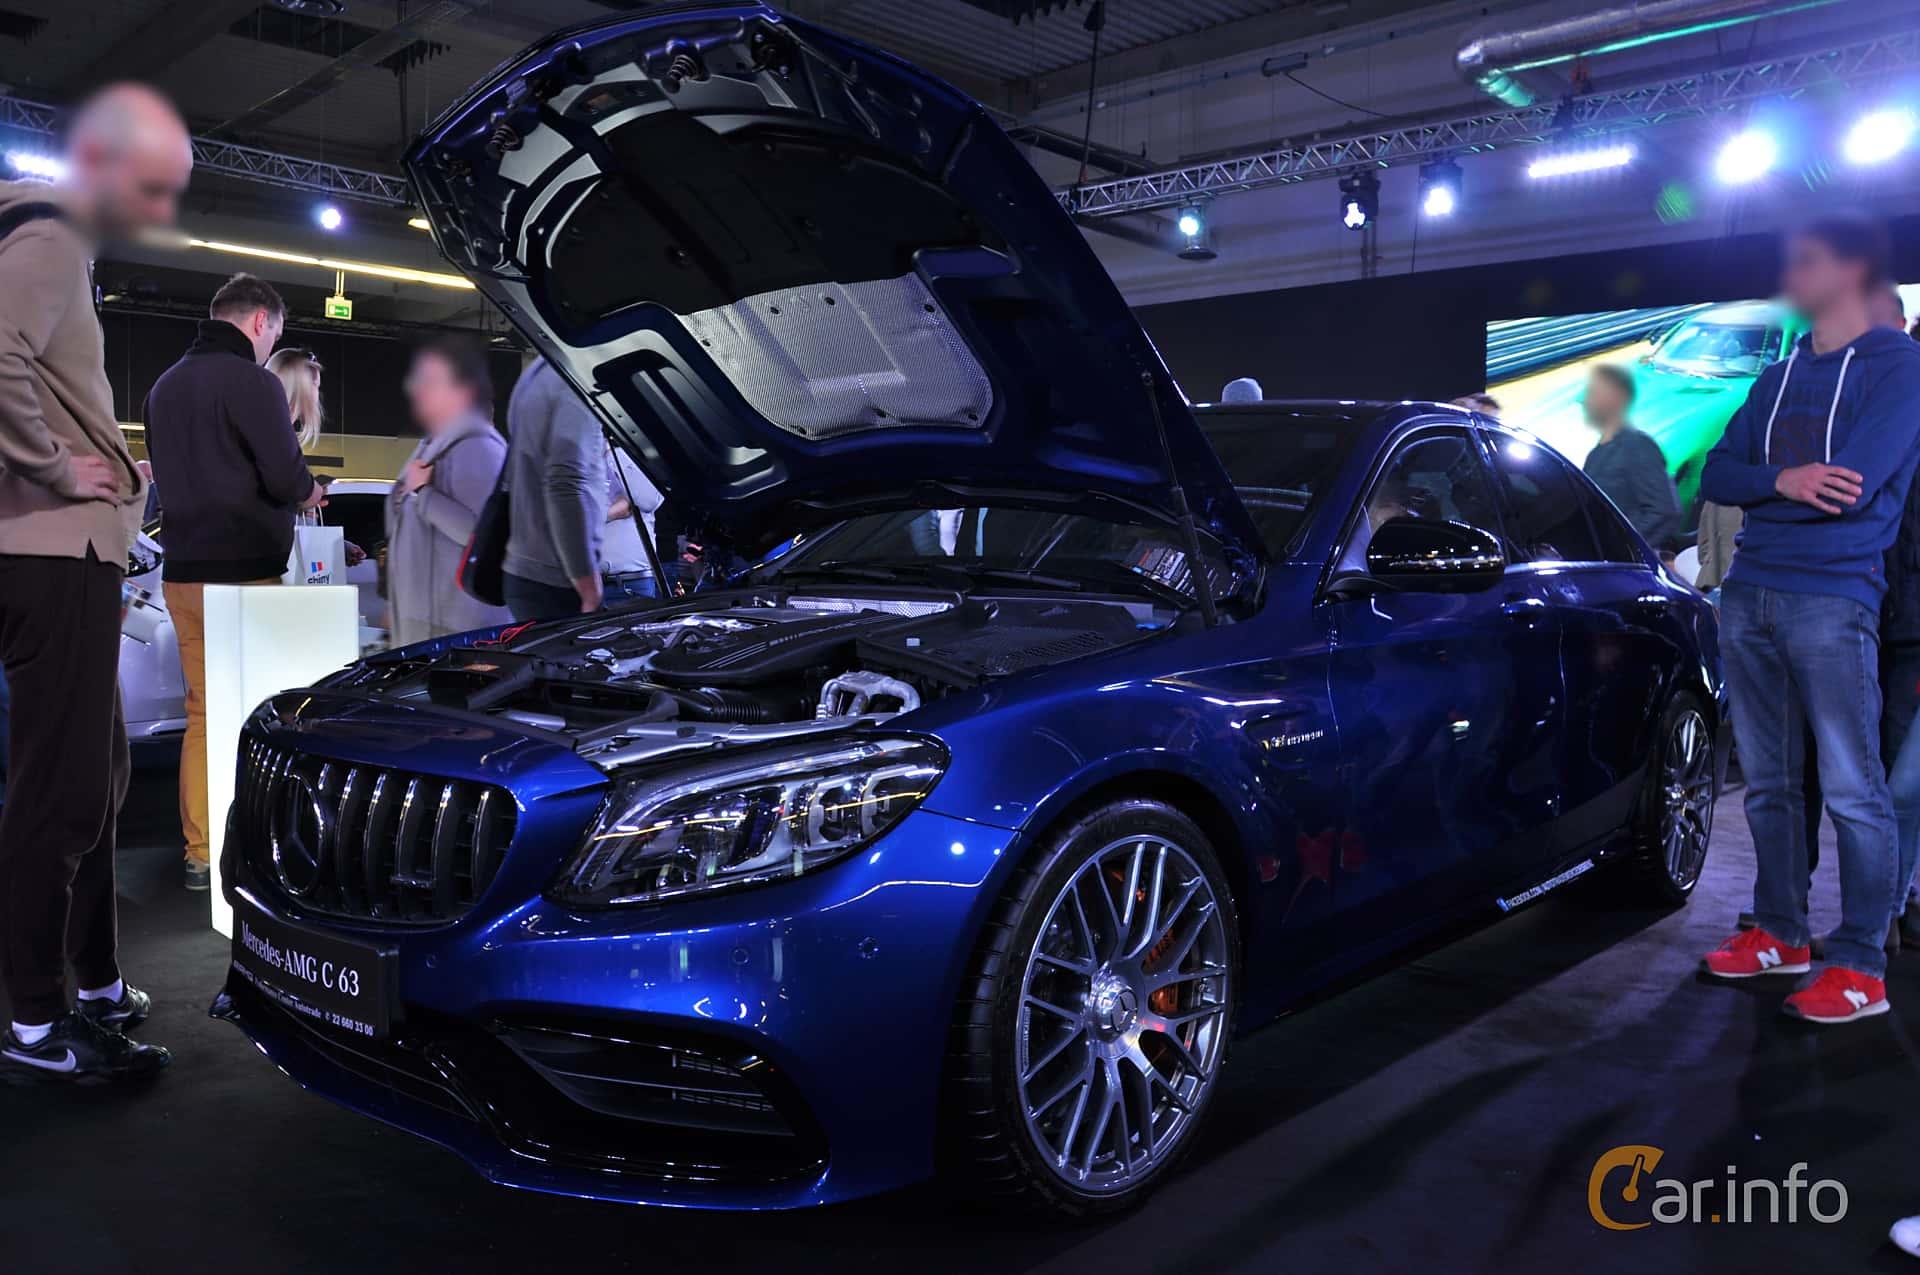 Mercedes-Benz AMG C 63  , 476hp, 2018 at Warsawa Motorshow 2018